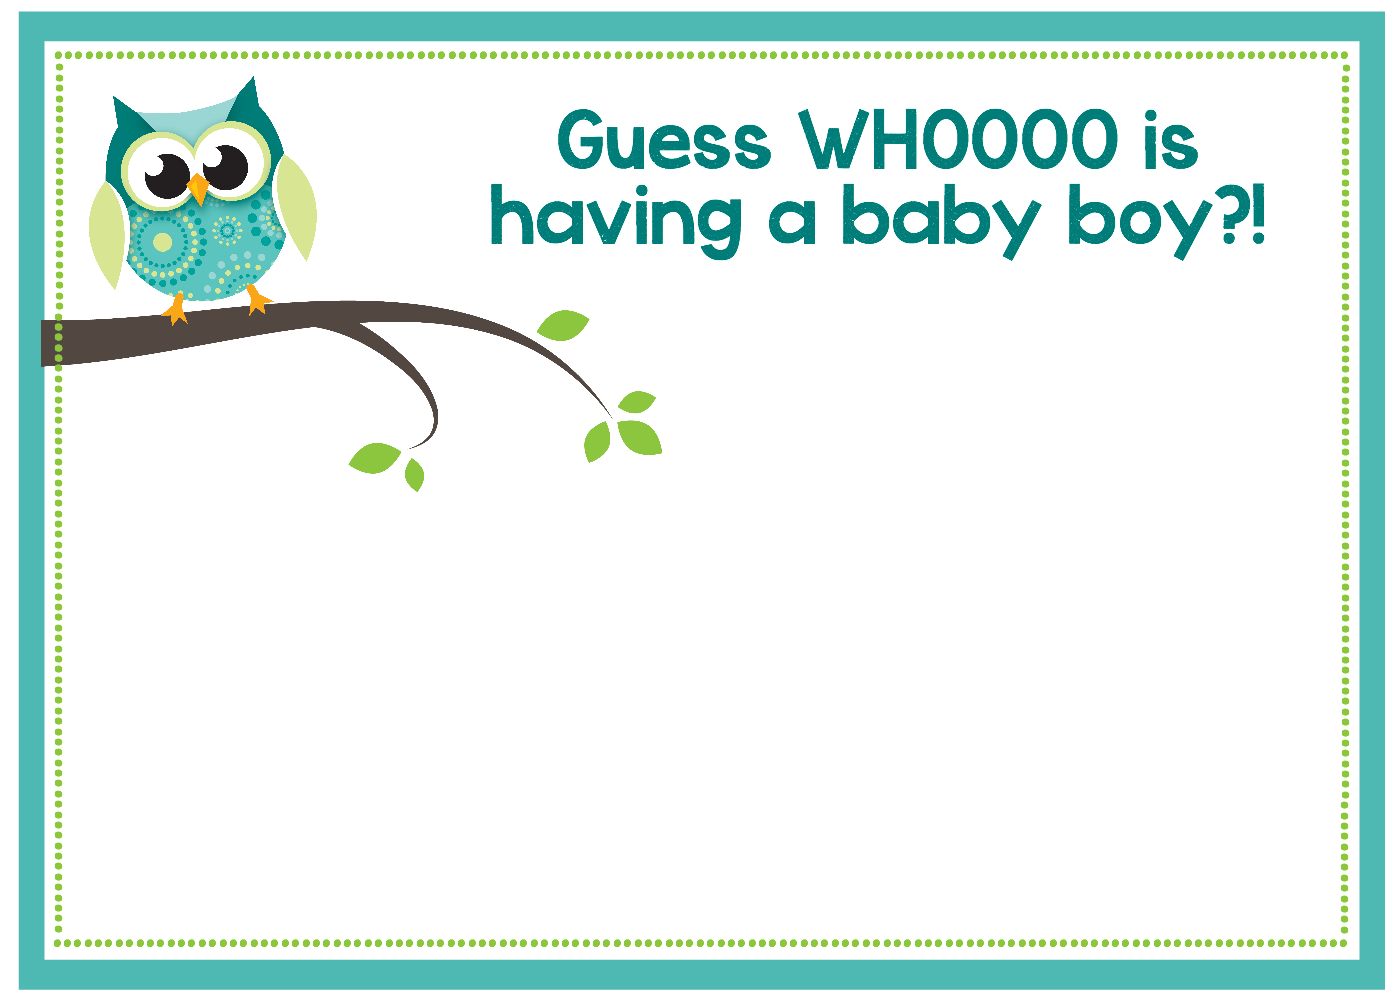 Free Printable Owl Baby Shower Invitations {& Other Printables} - Free Baby Boy Shower Invitations Printable